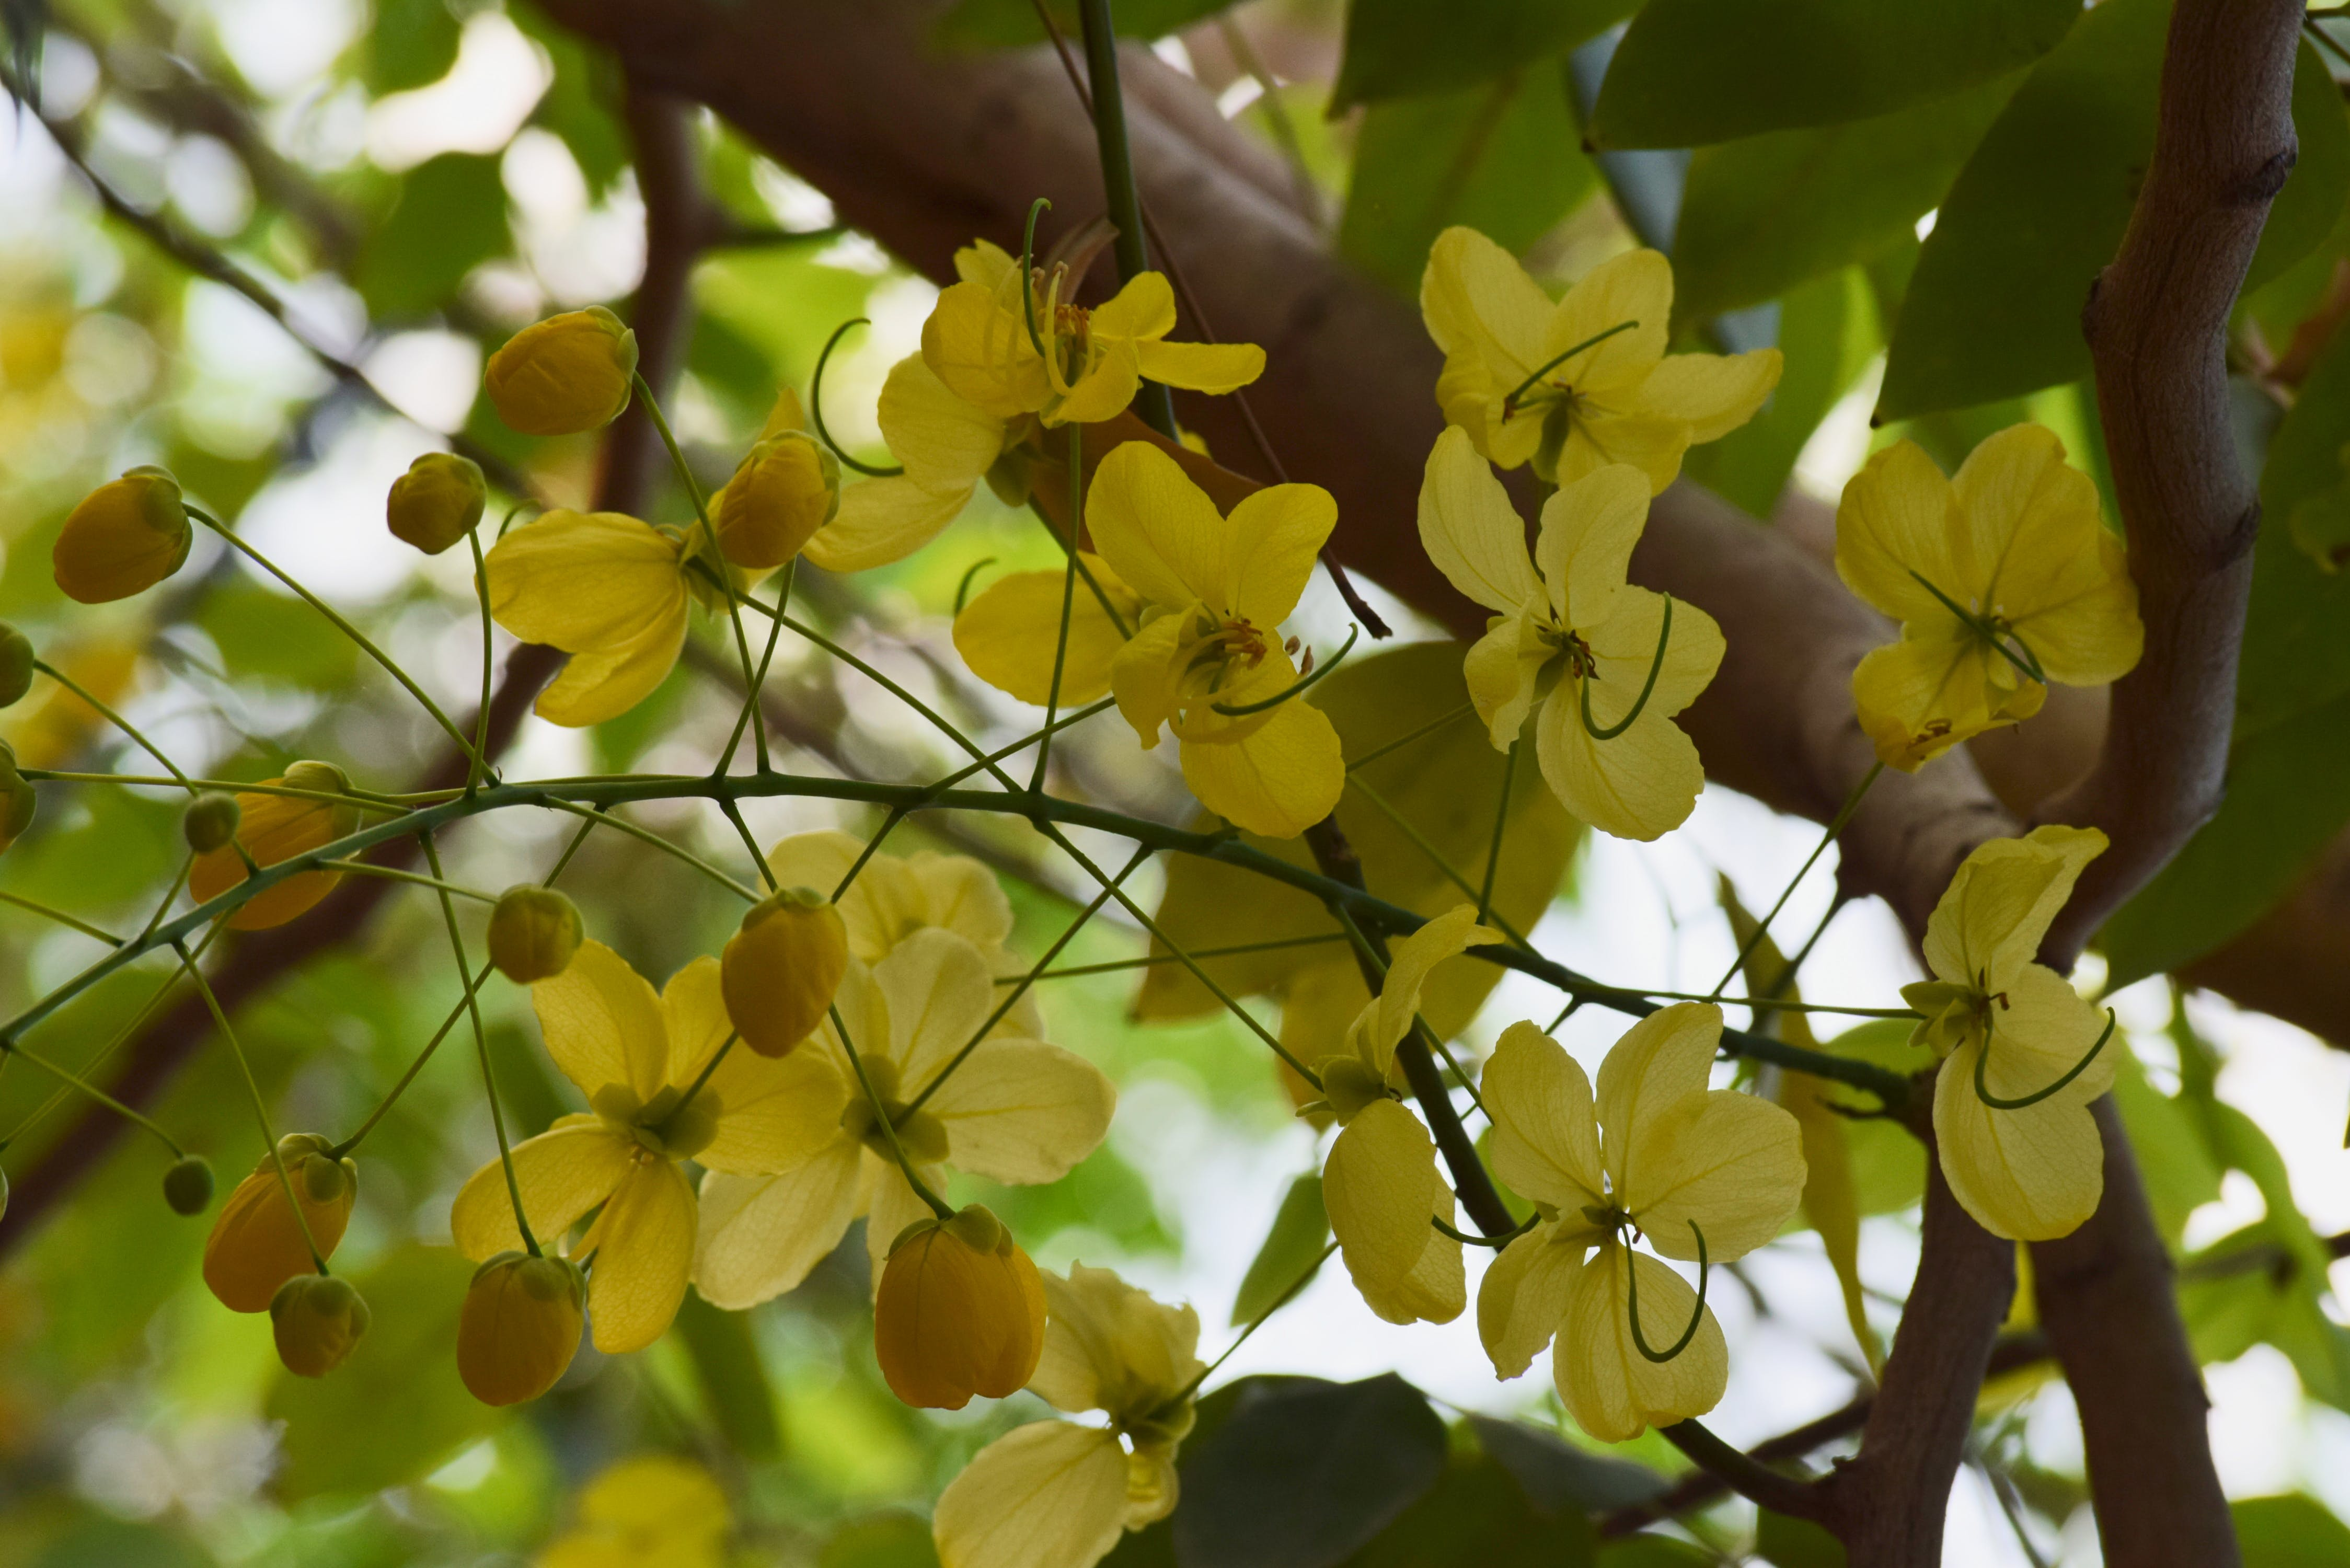 Free stock photo of flower, yellow flowers